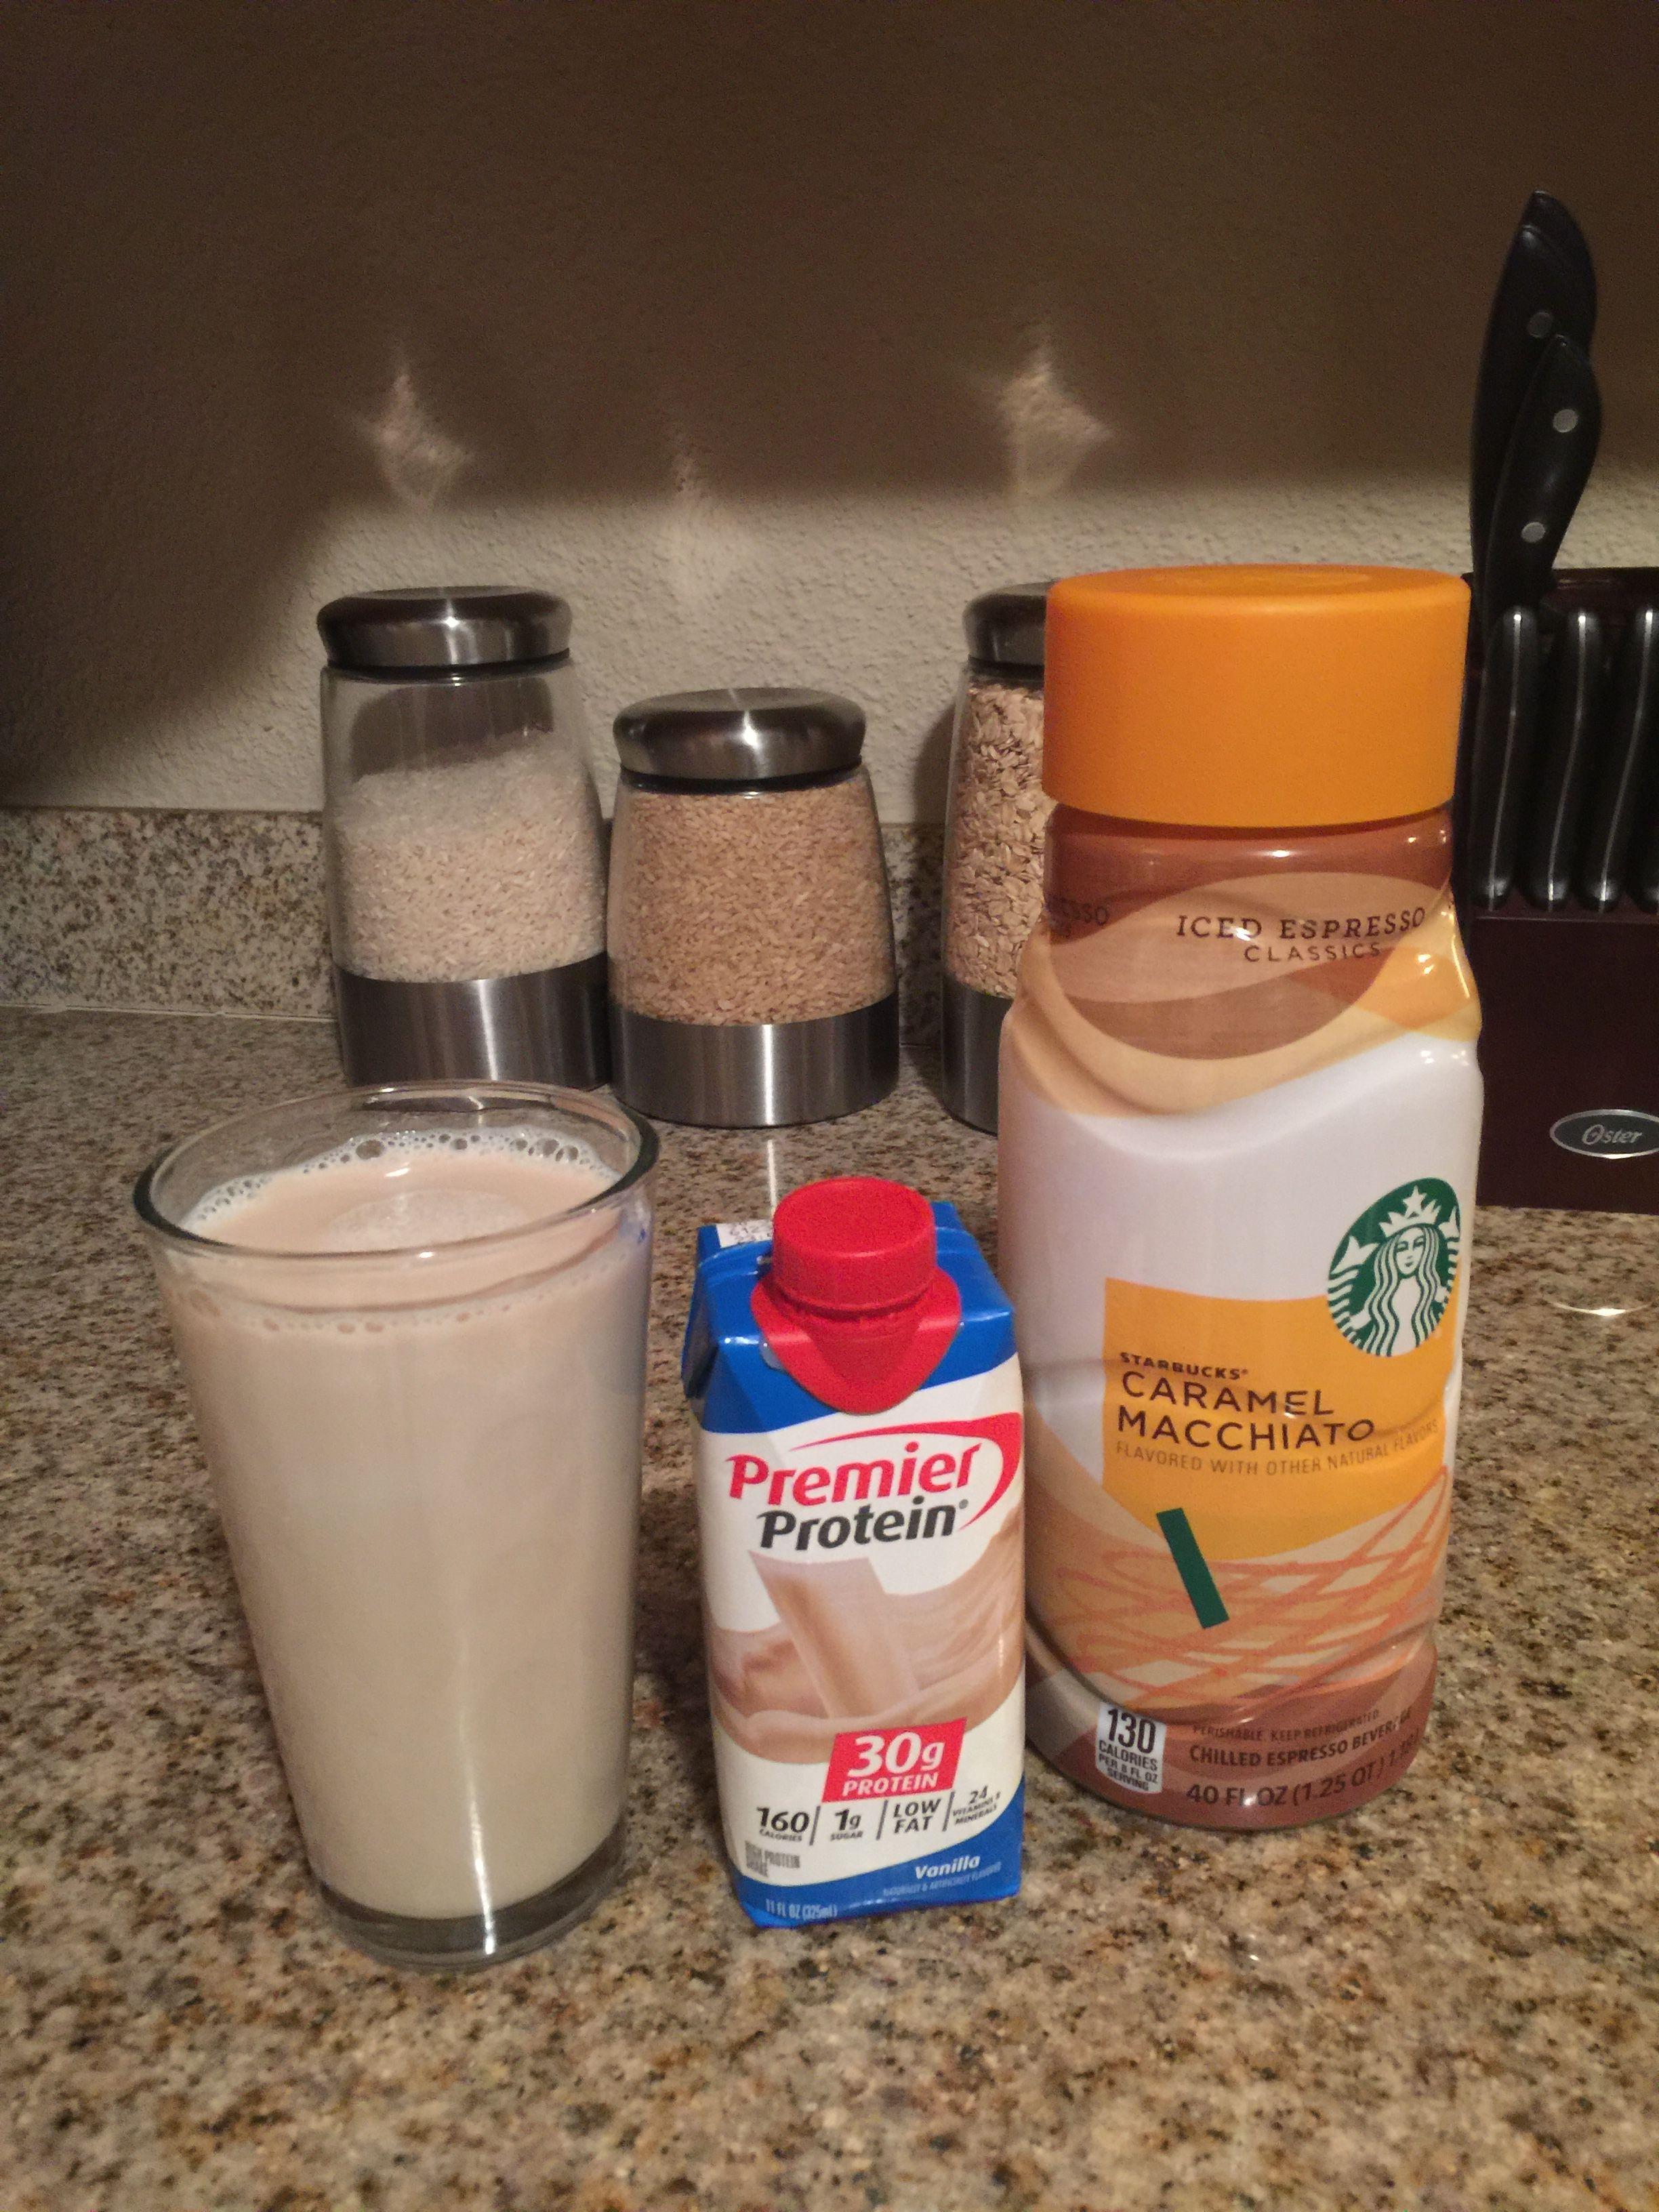 Delicious vanilla premium protein shake mixed with